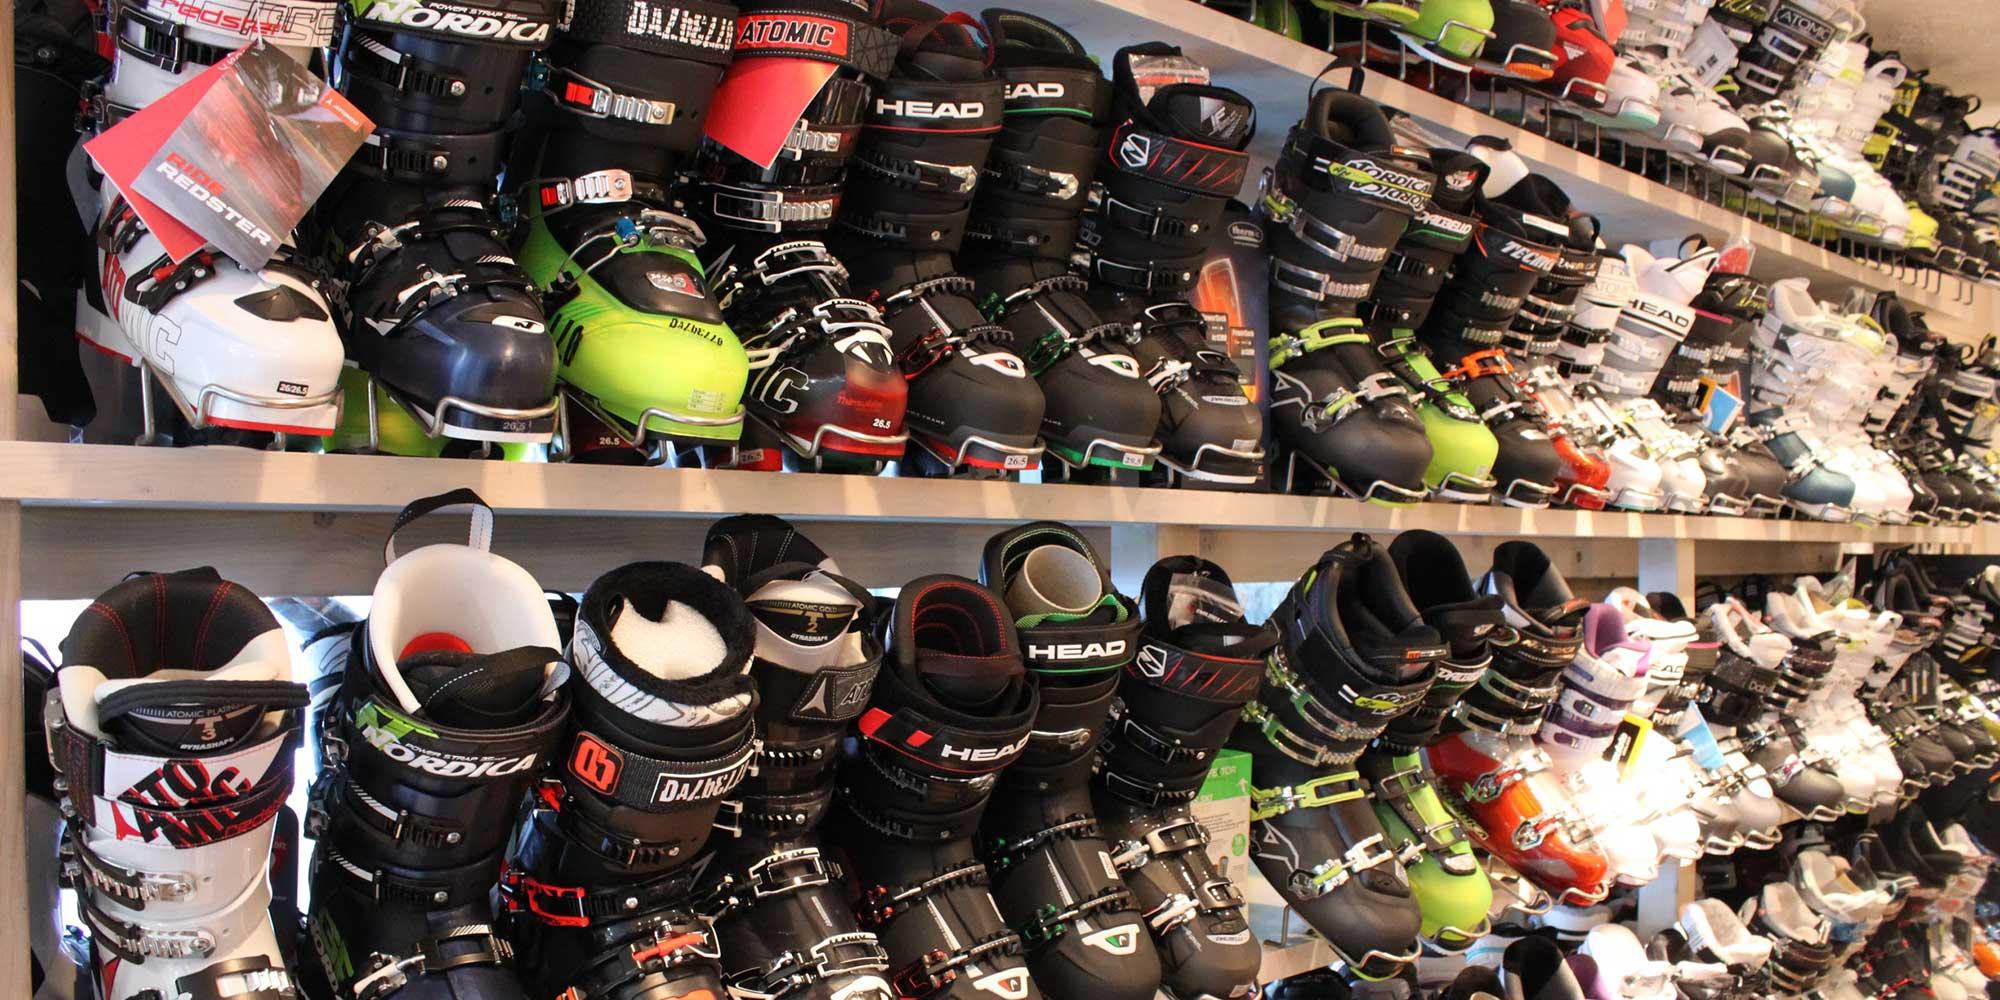 Choisir ses chaussures de ski